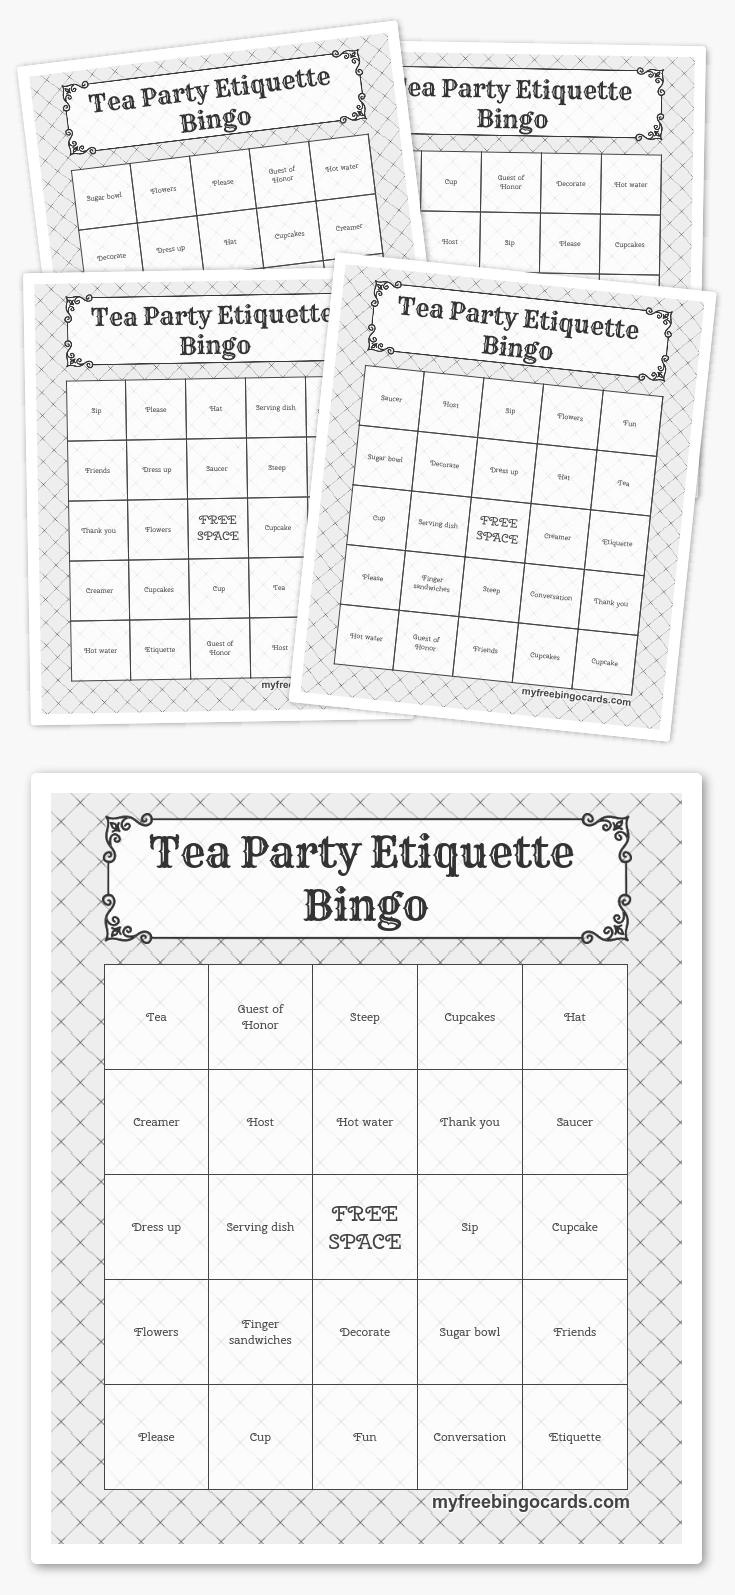 Tea Party Etiquette Bingo   Free Printable Bingo Cards